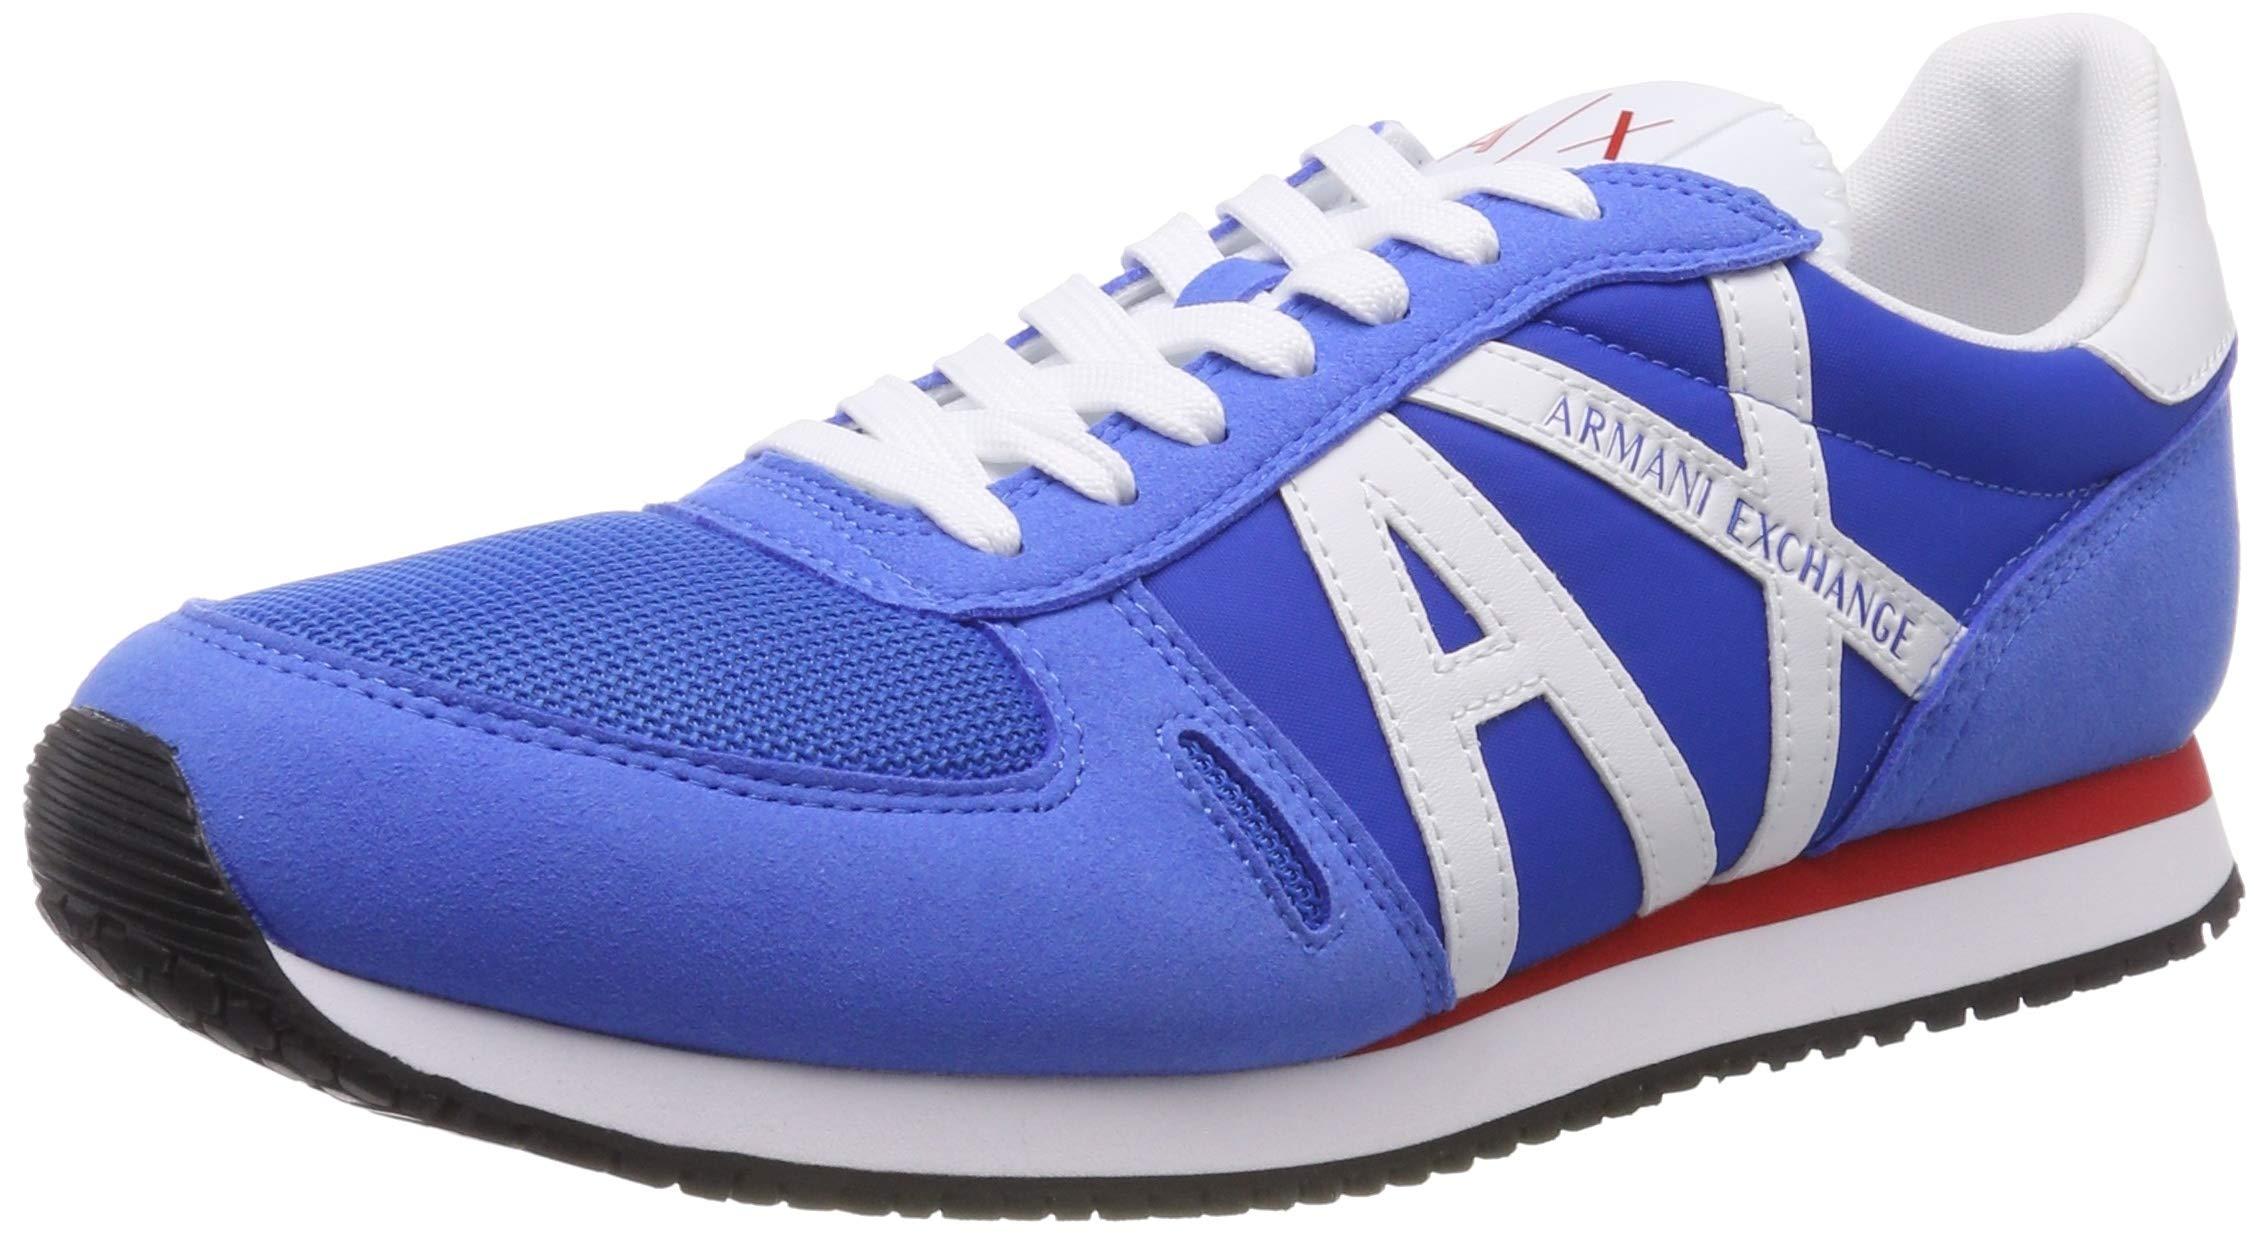 A X Armani Exchange Men's Lace Up Sneaker with Logo, Blue + White, 7 M US